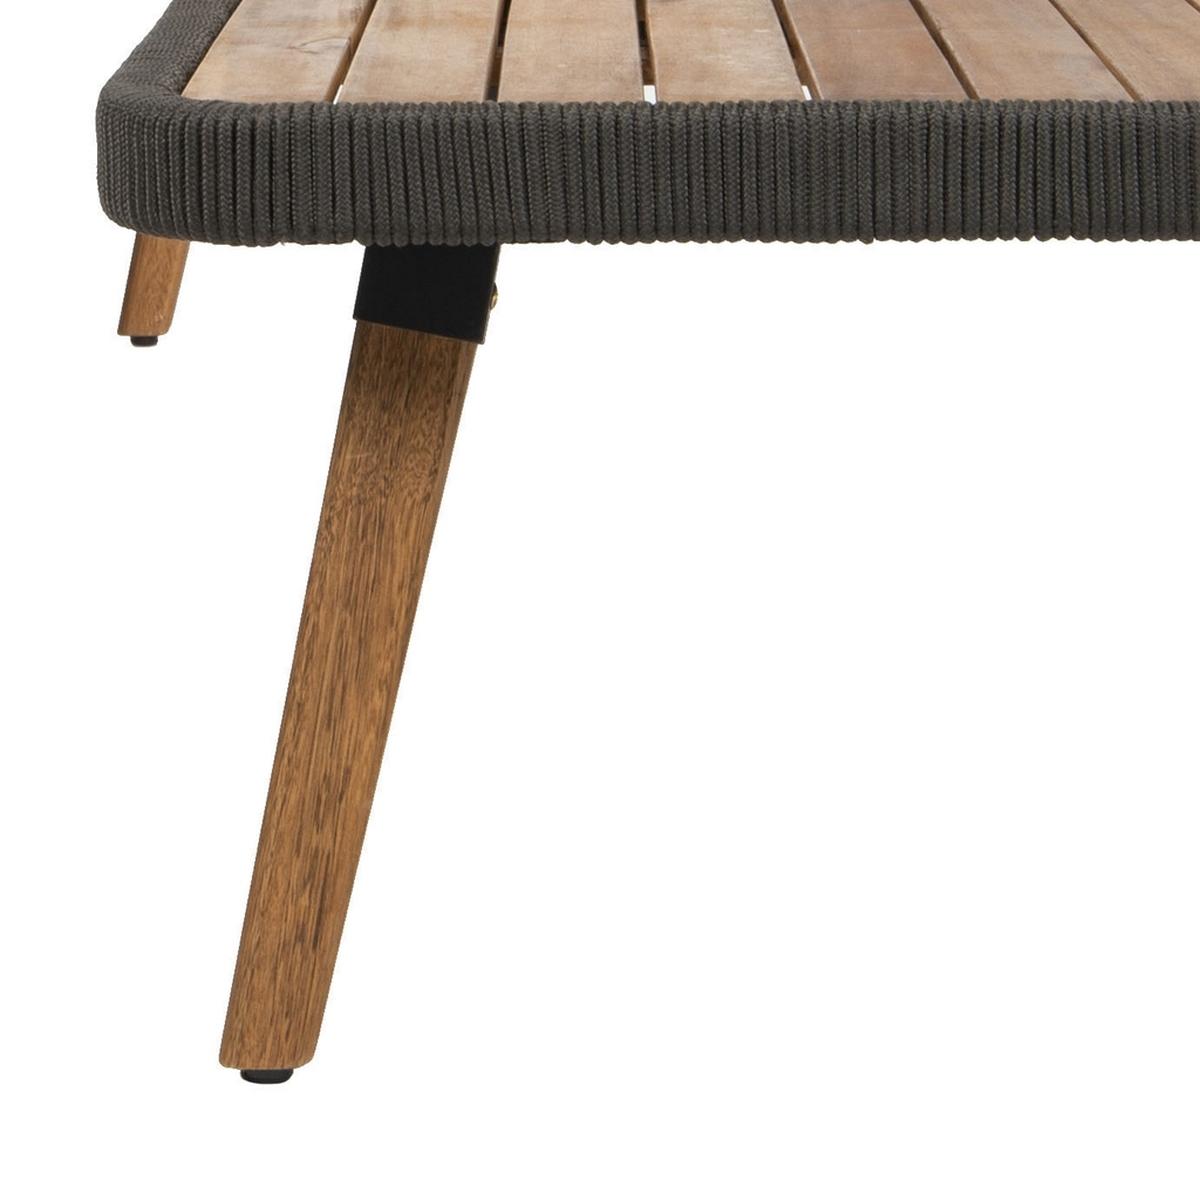 PAT7049B Patio Sets - 4 Piece - Furniture by Safavieh on Safavieh Raldin id=43503